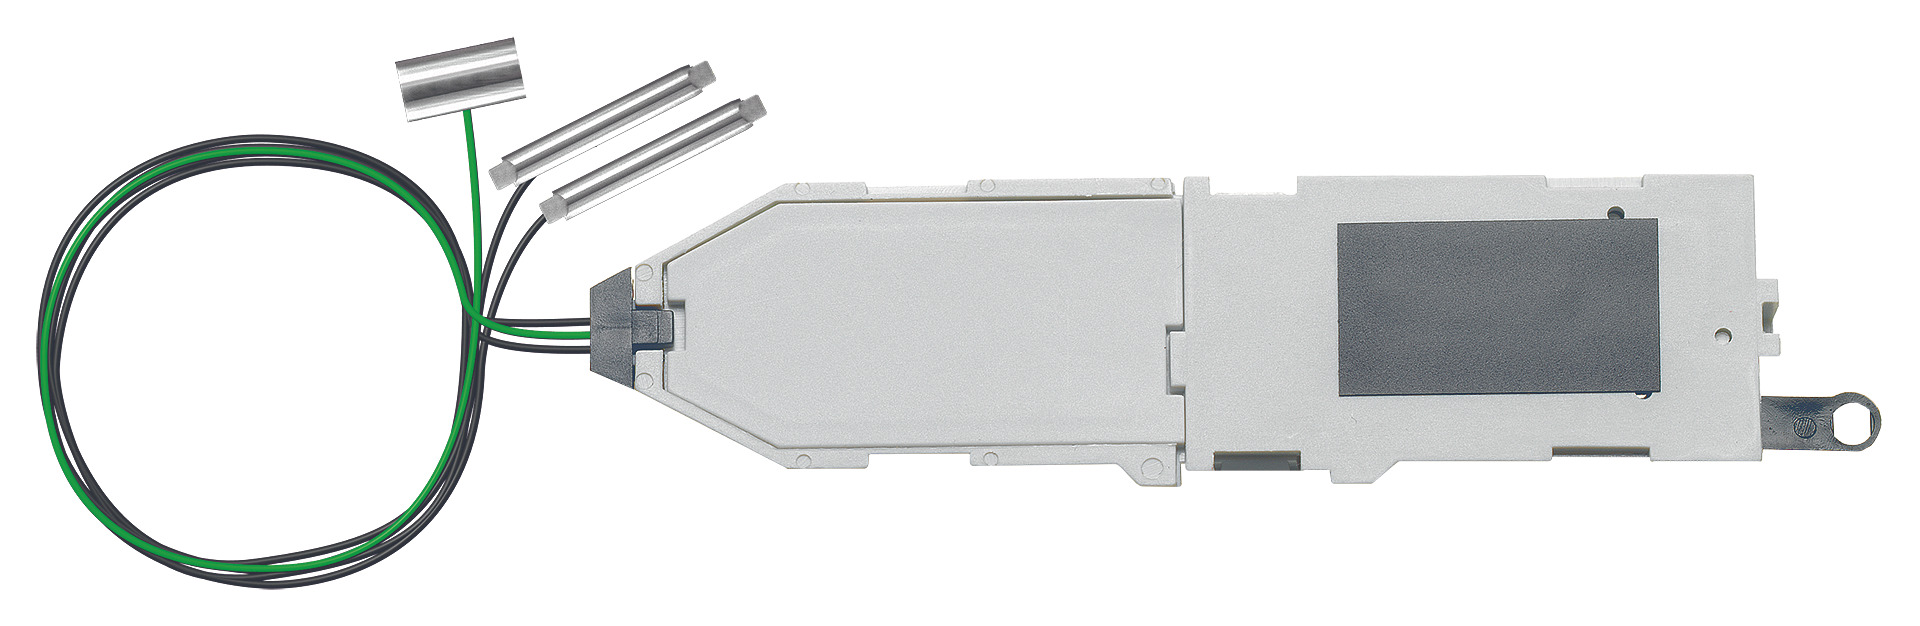 H0 Digital-Weichenantrieb